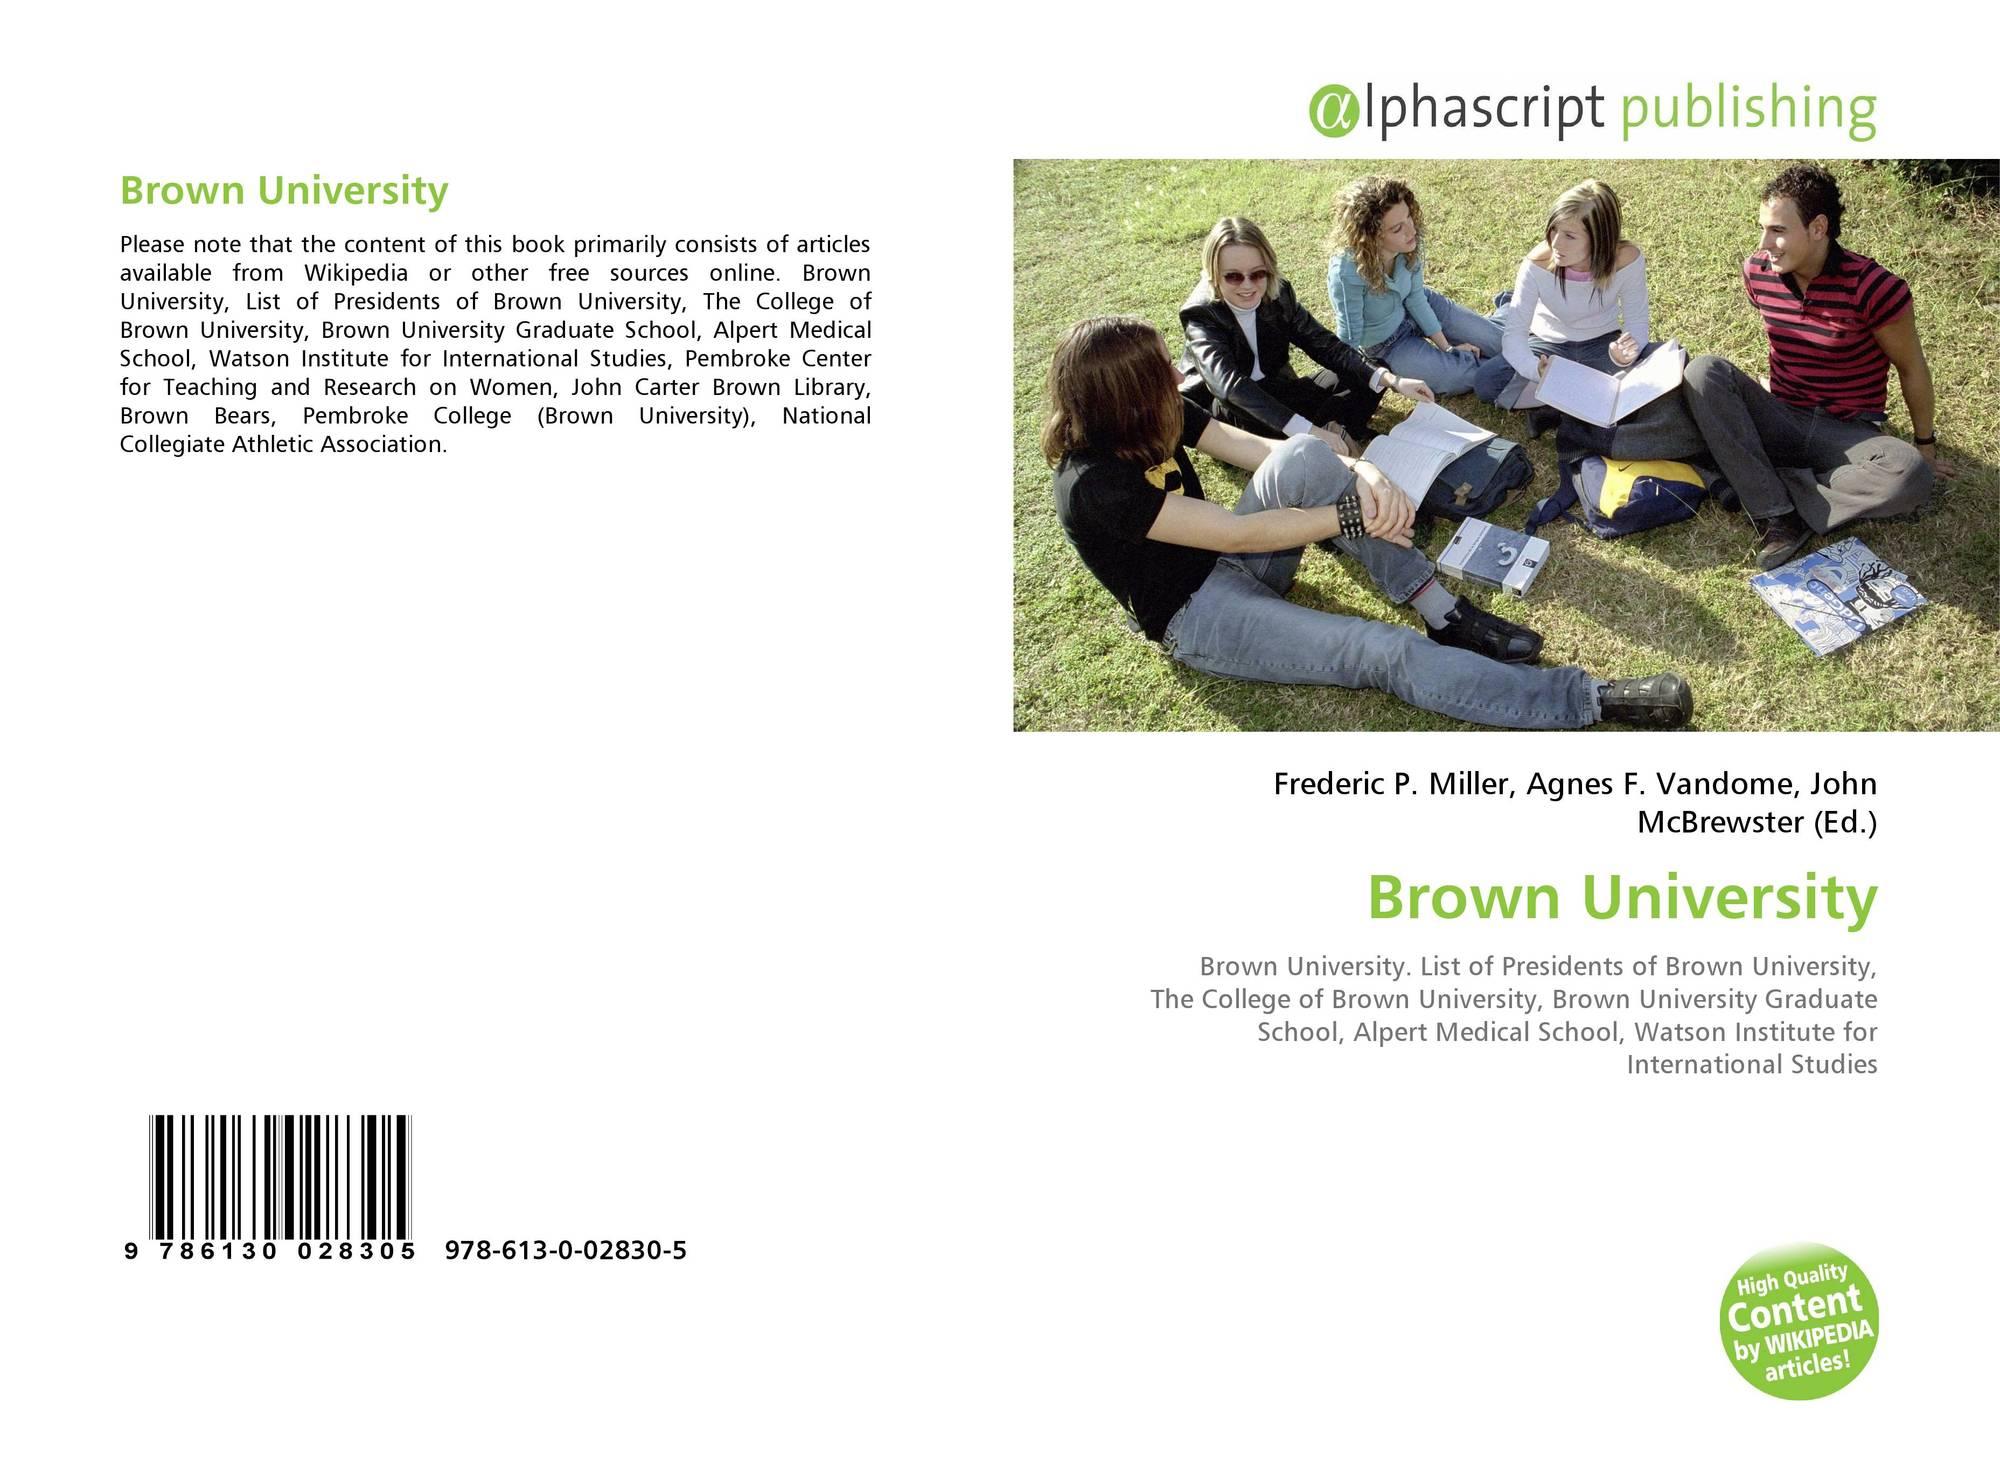 Brown University, 978-613-0-02830-5, 613002830X ,9786130028305